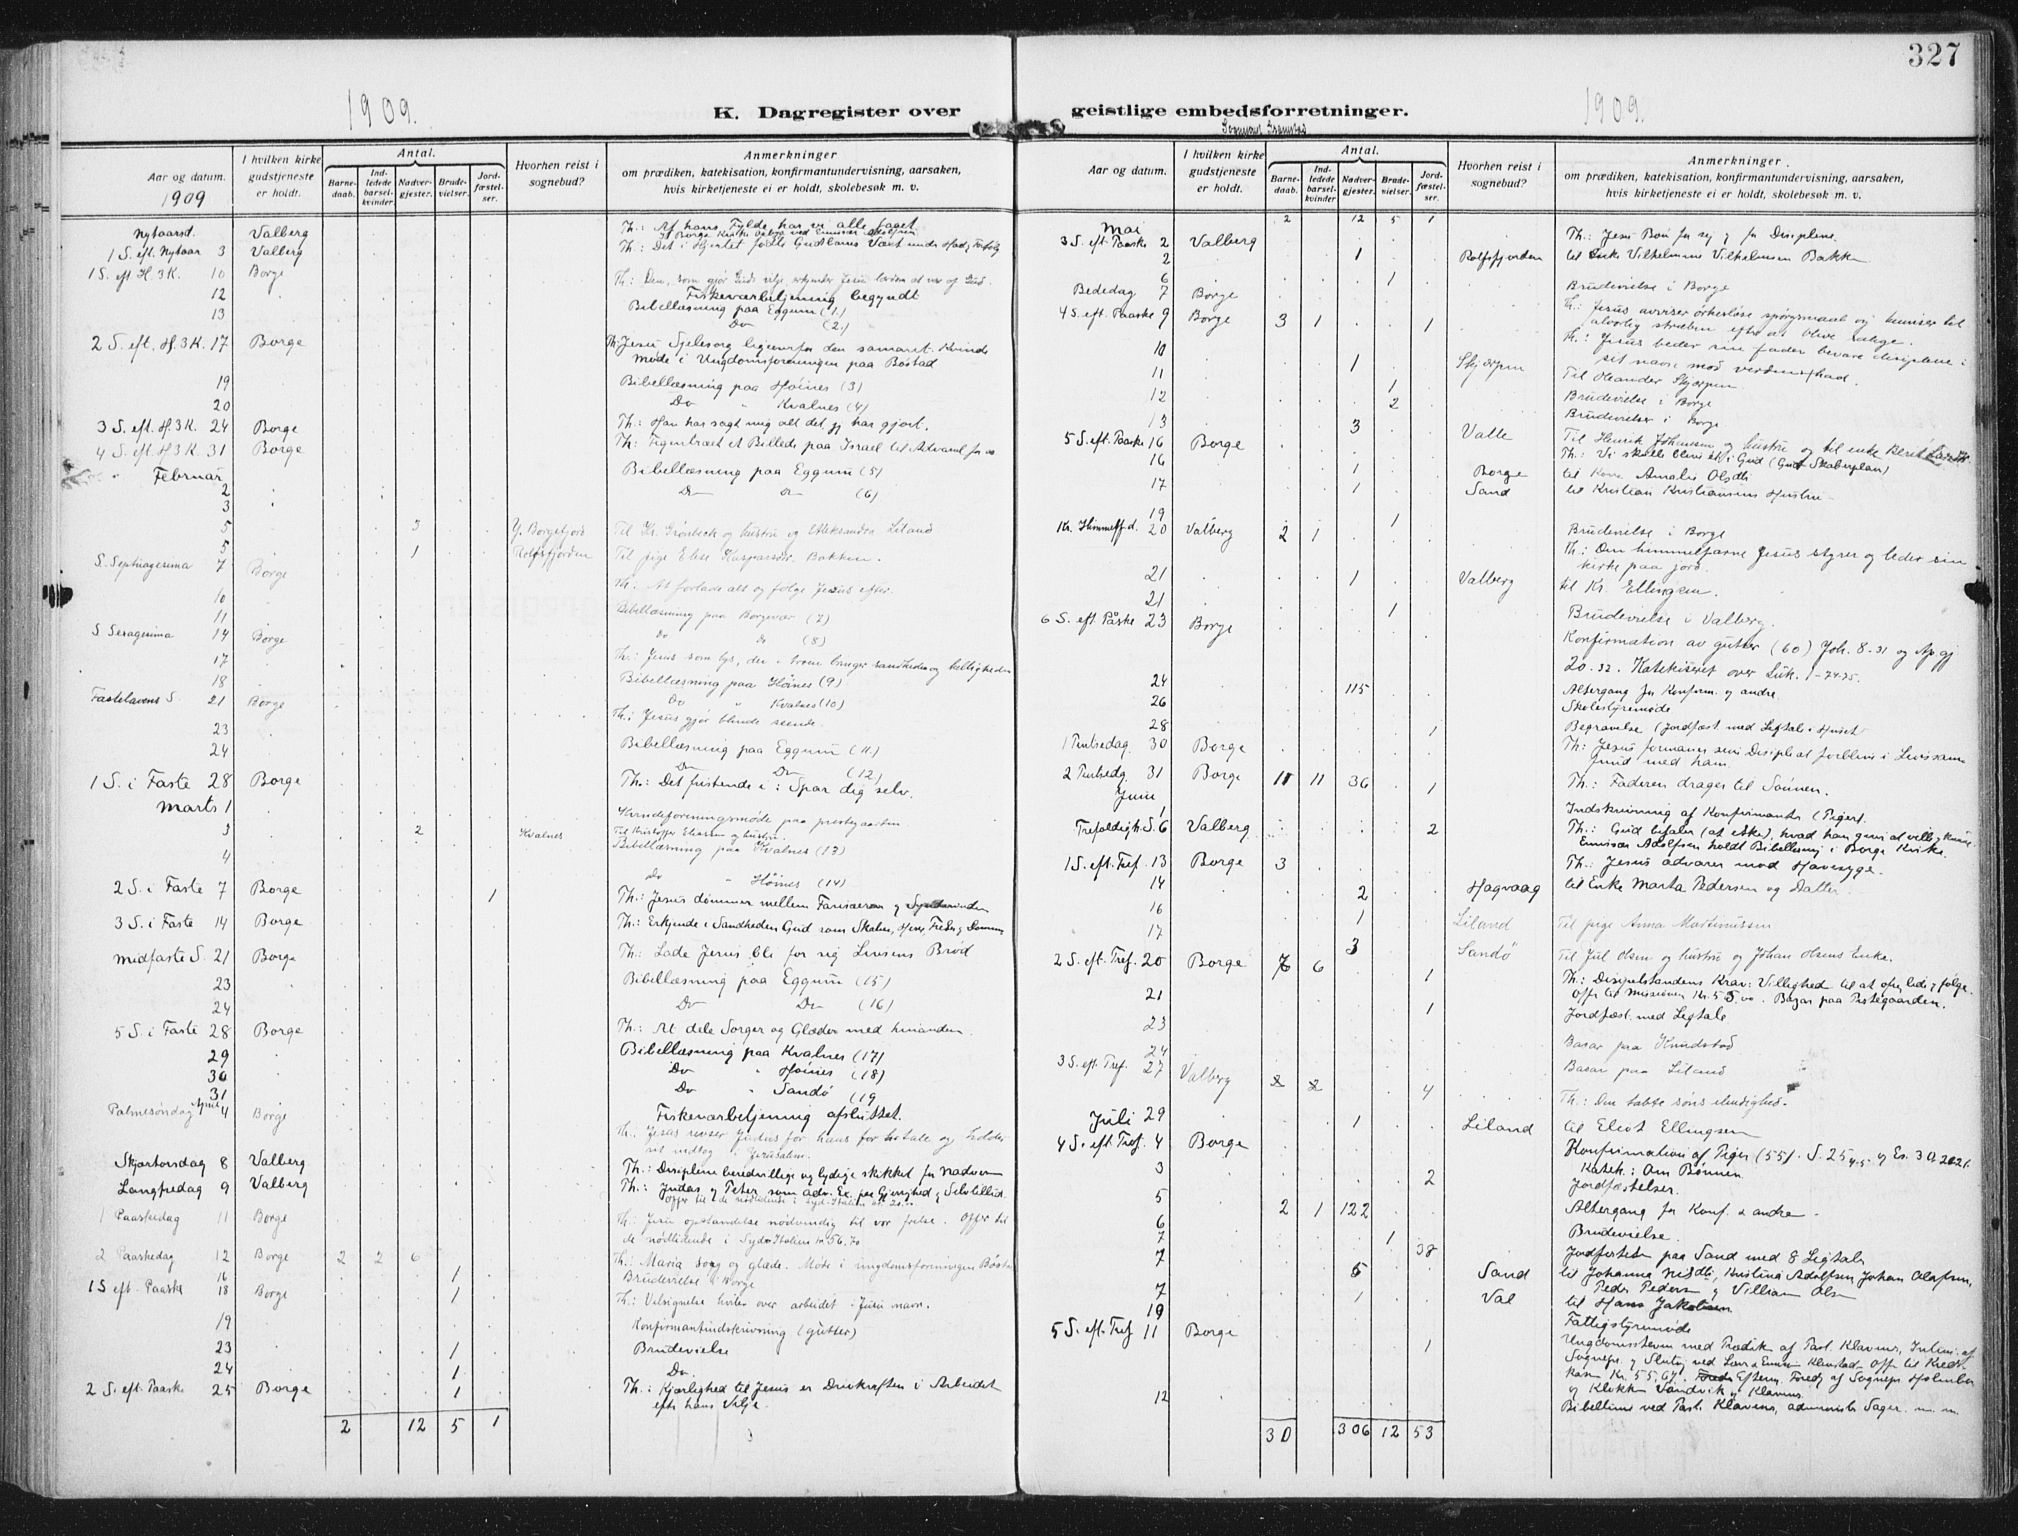 SAT, Ministerialprotokoller, klokkerbøker og fødselsregistre - Nordland, 880/L1135: Ministerialbok nr. 880A09, 1908-1919, s. 327